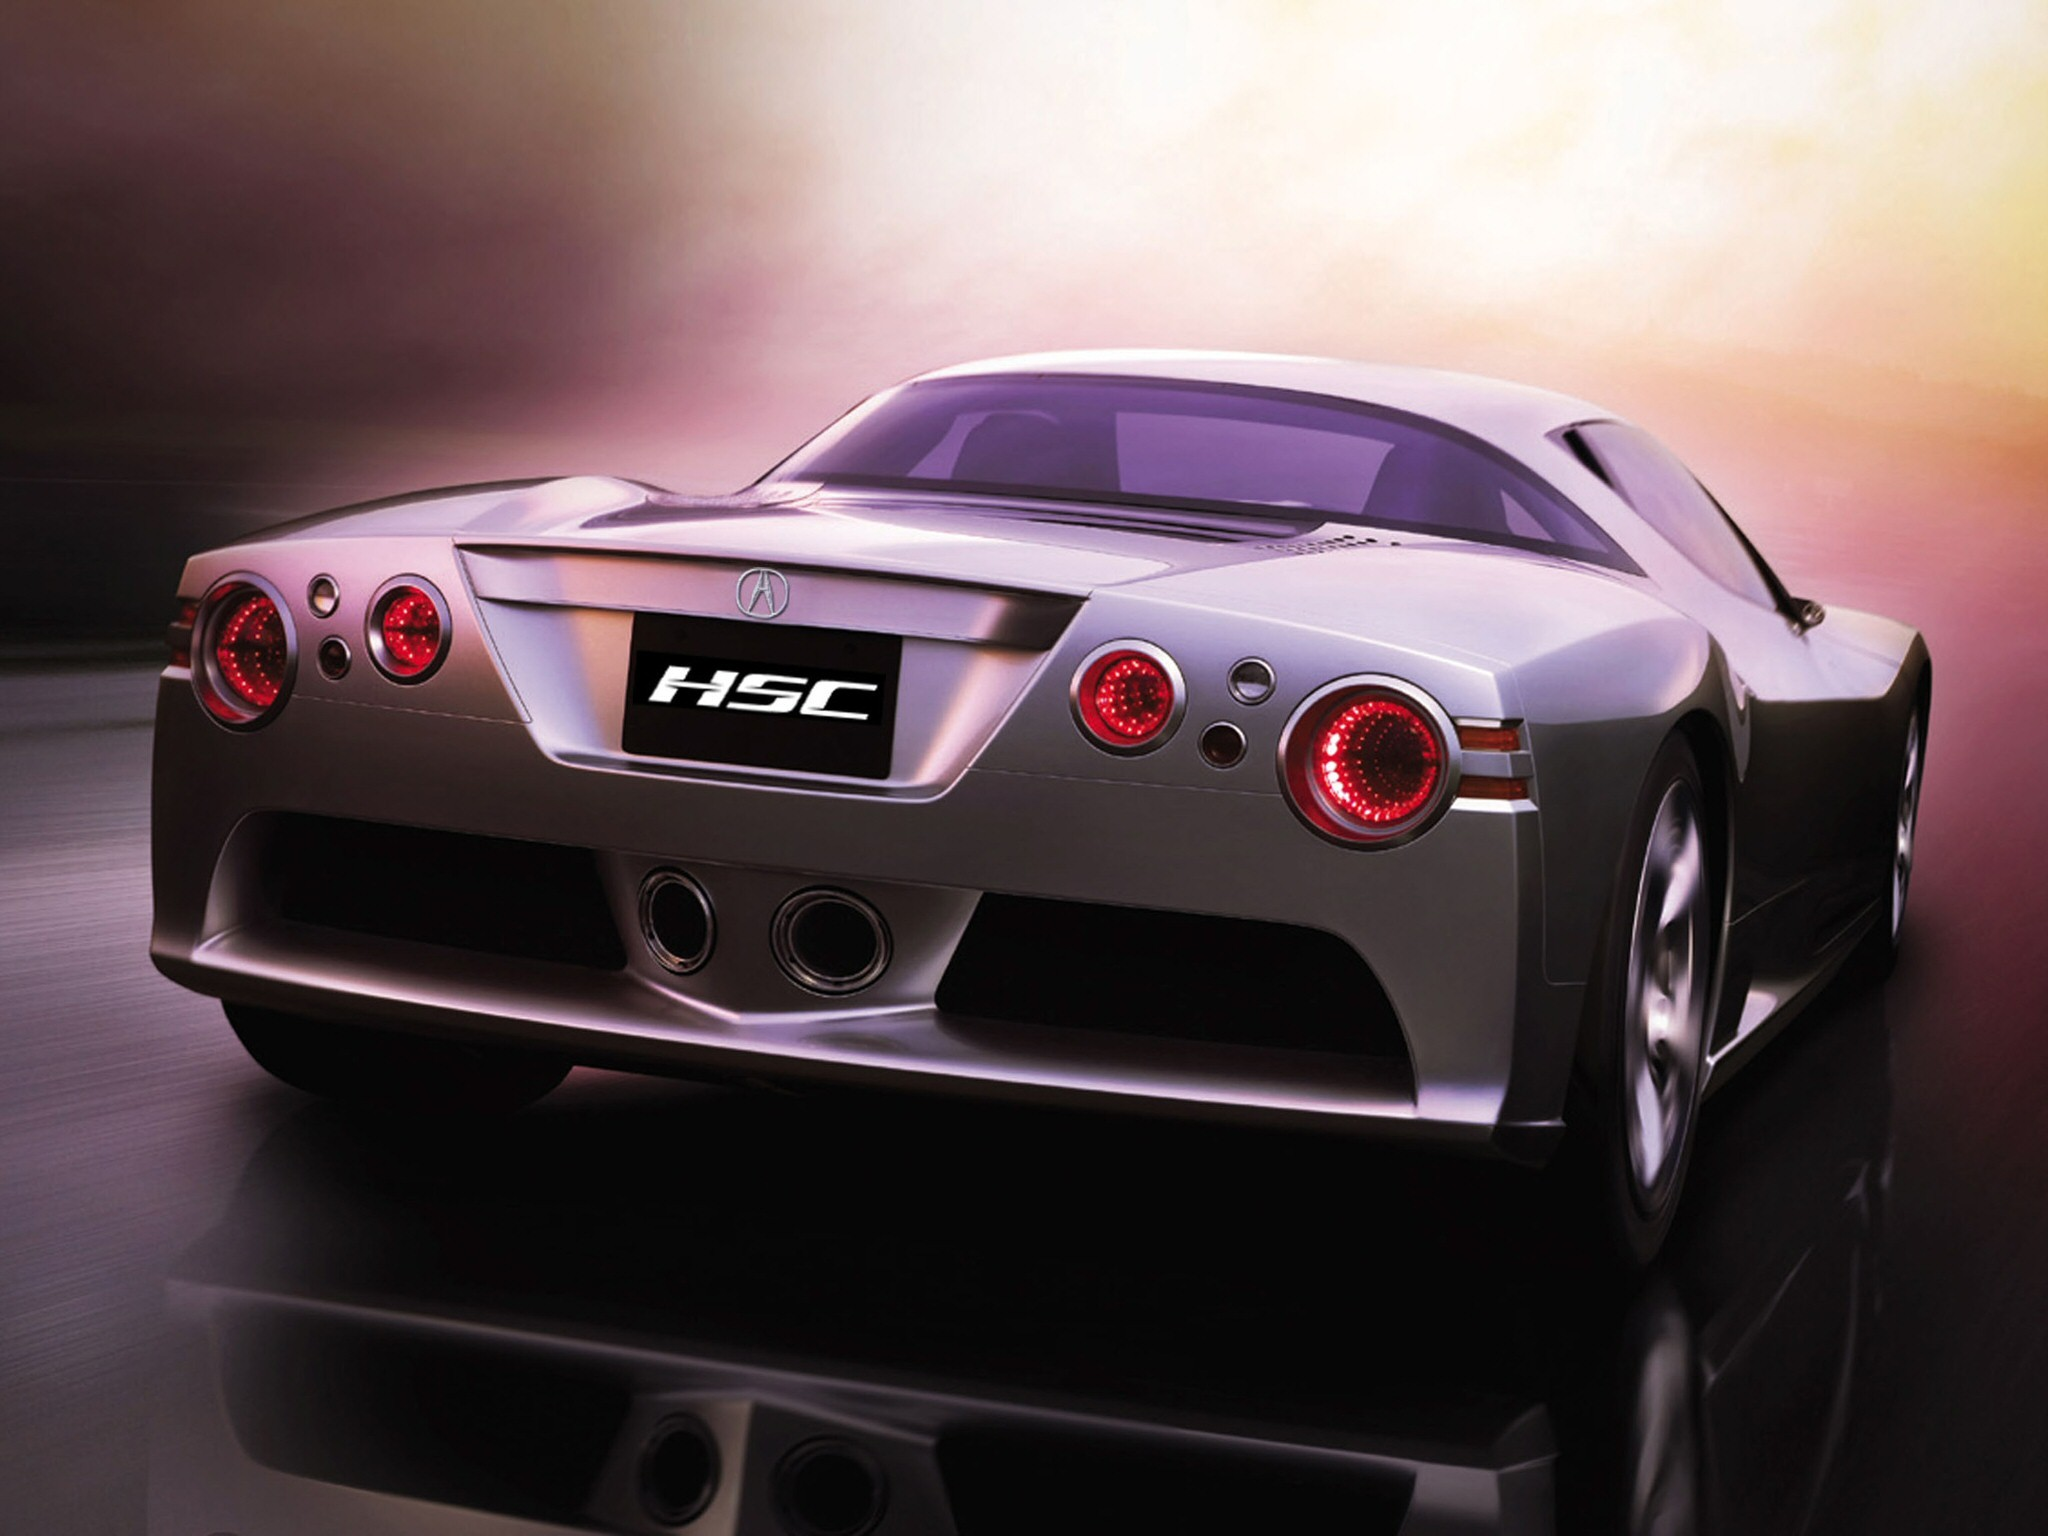 2004 Acura High-Performance HSC